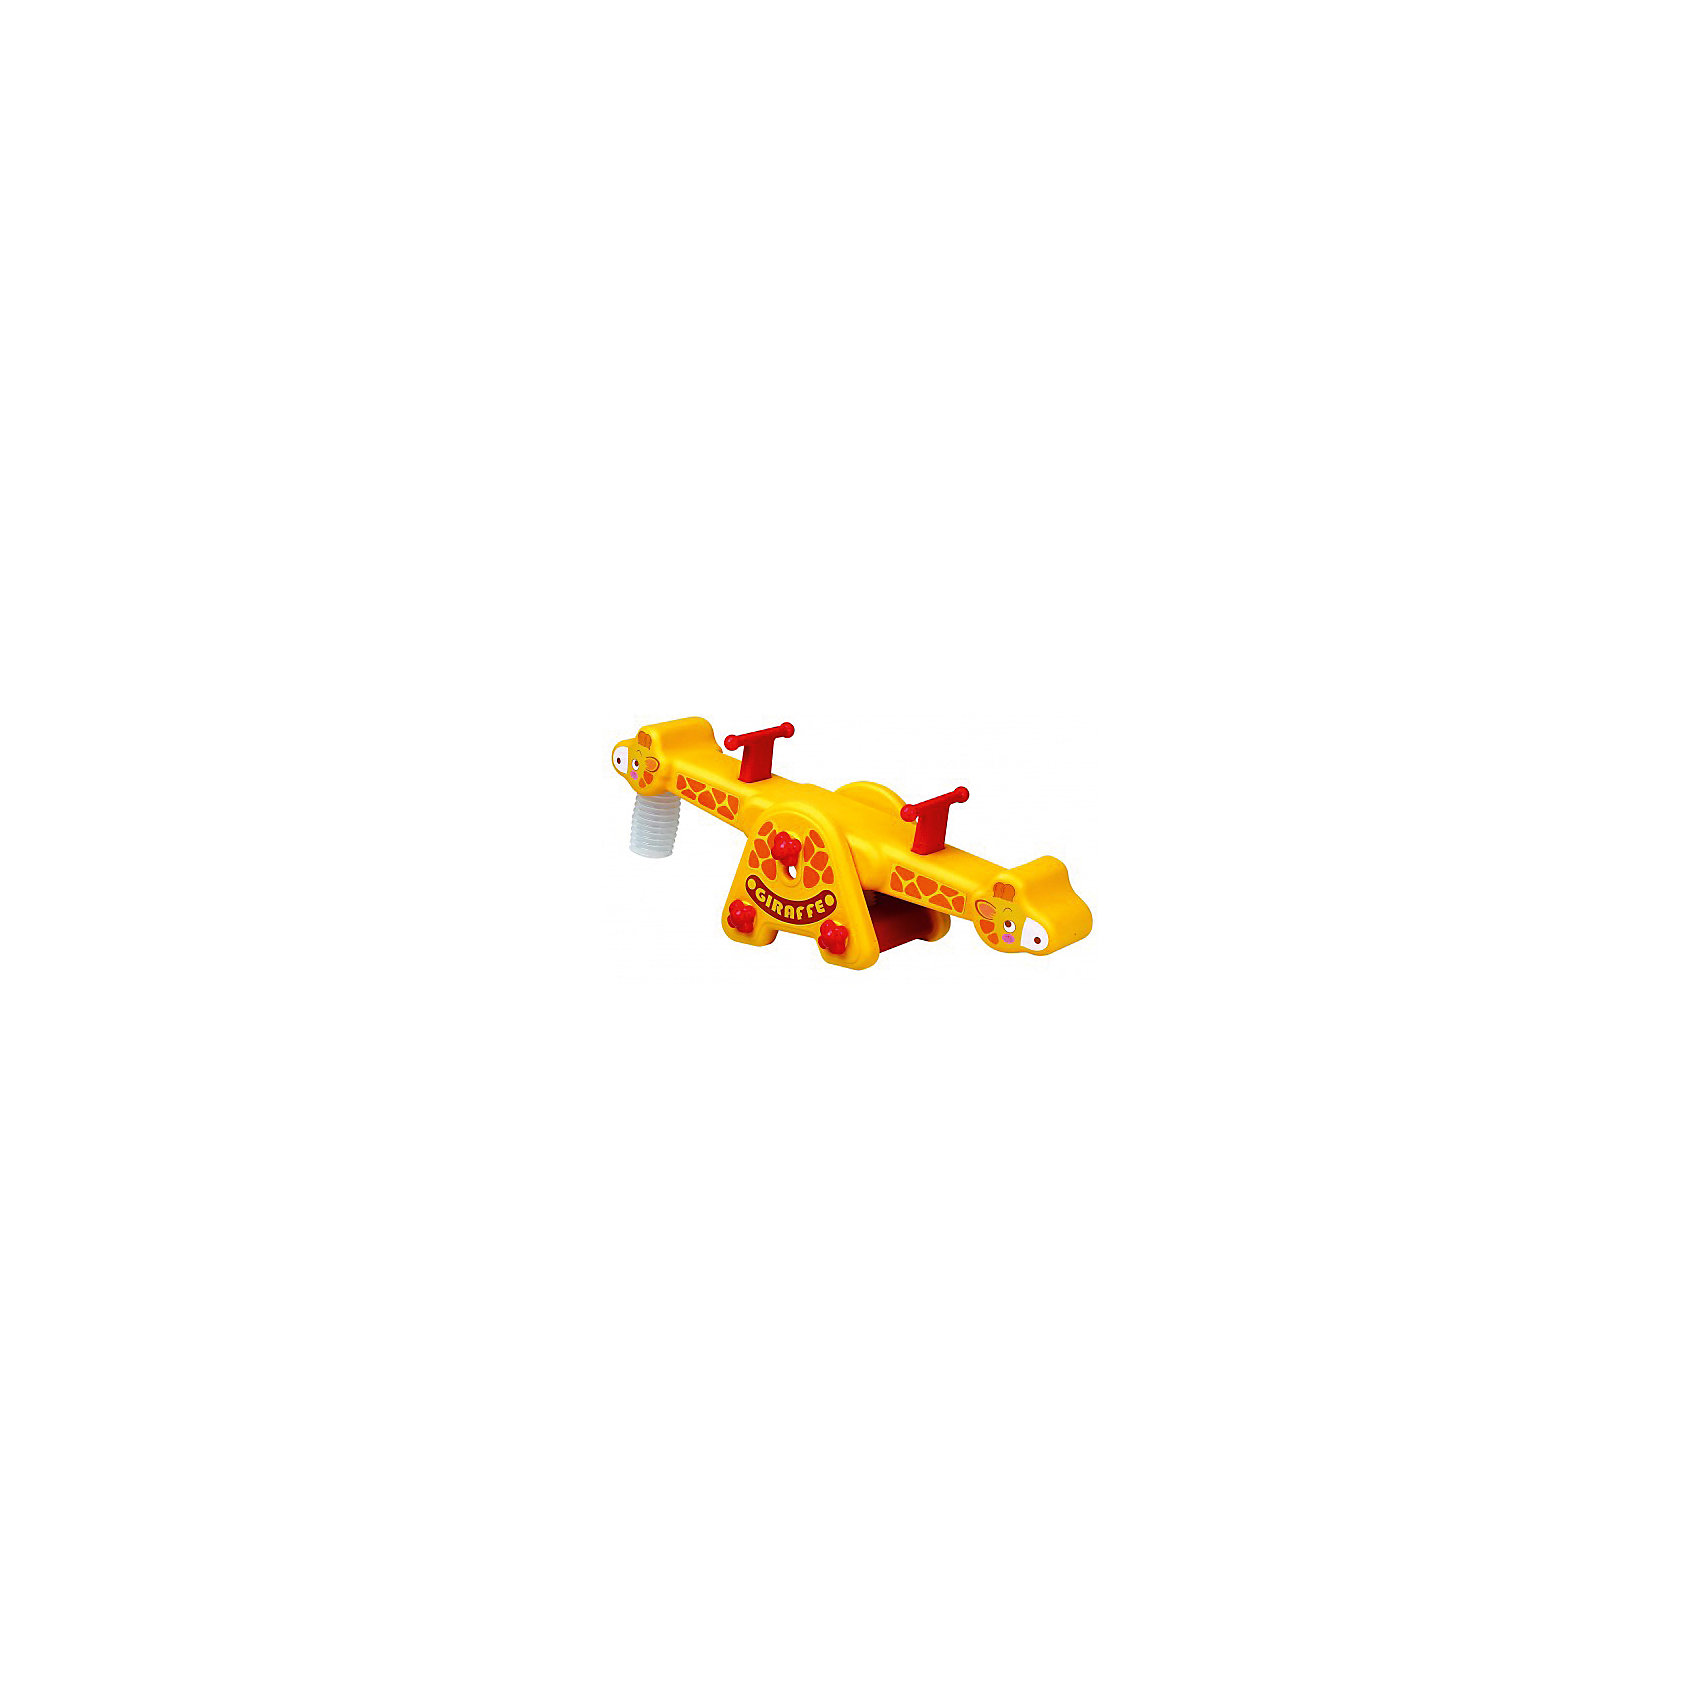 Качели-качалка Жираф, 34X24X121 см, EDU PLAY